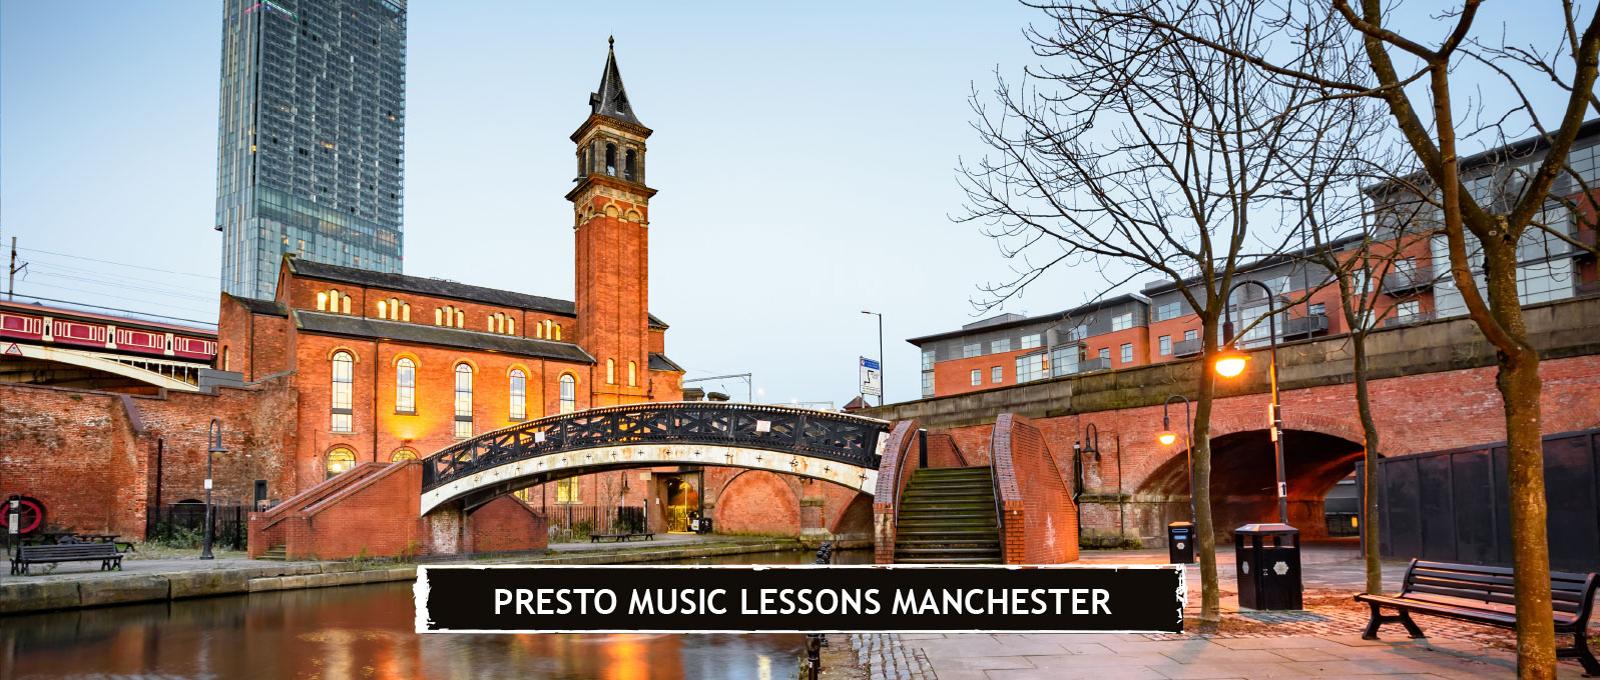 Presto Music Lessons Manchester